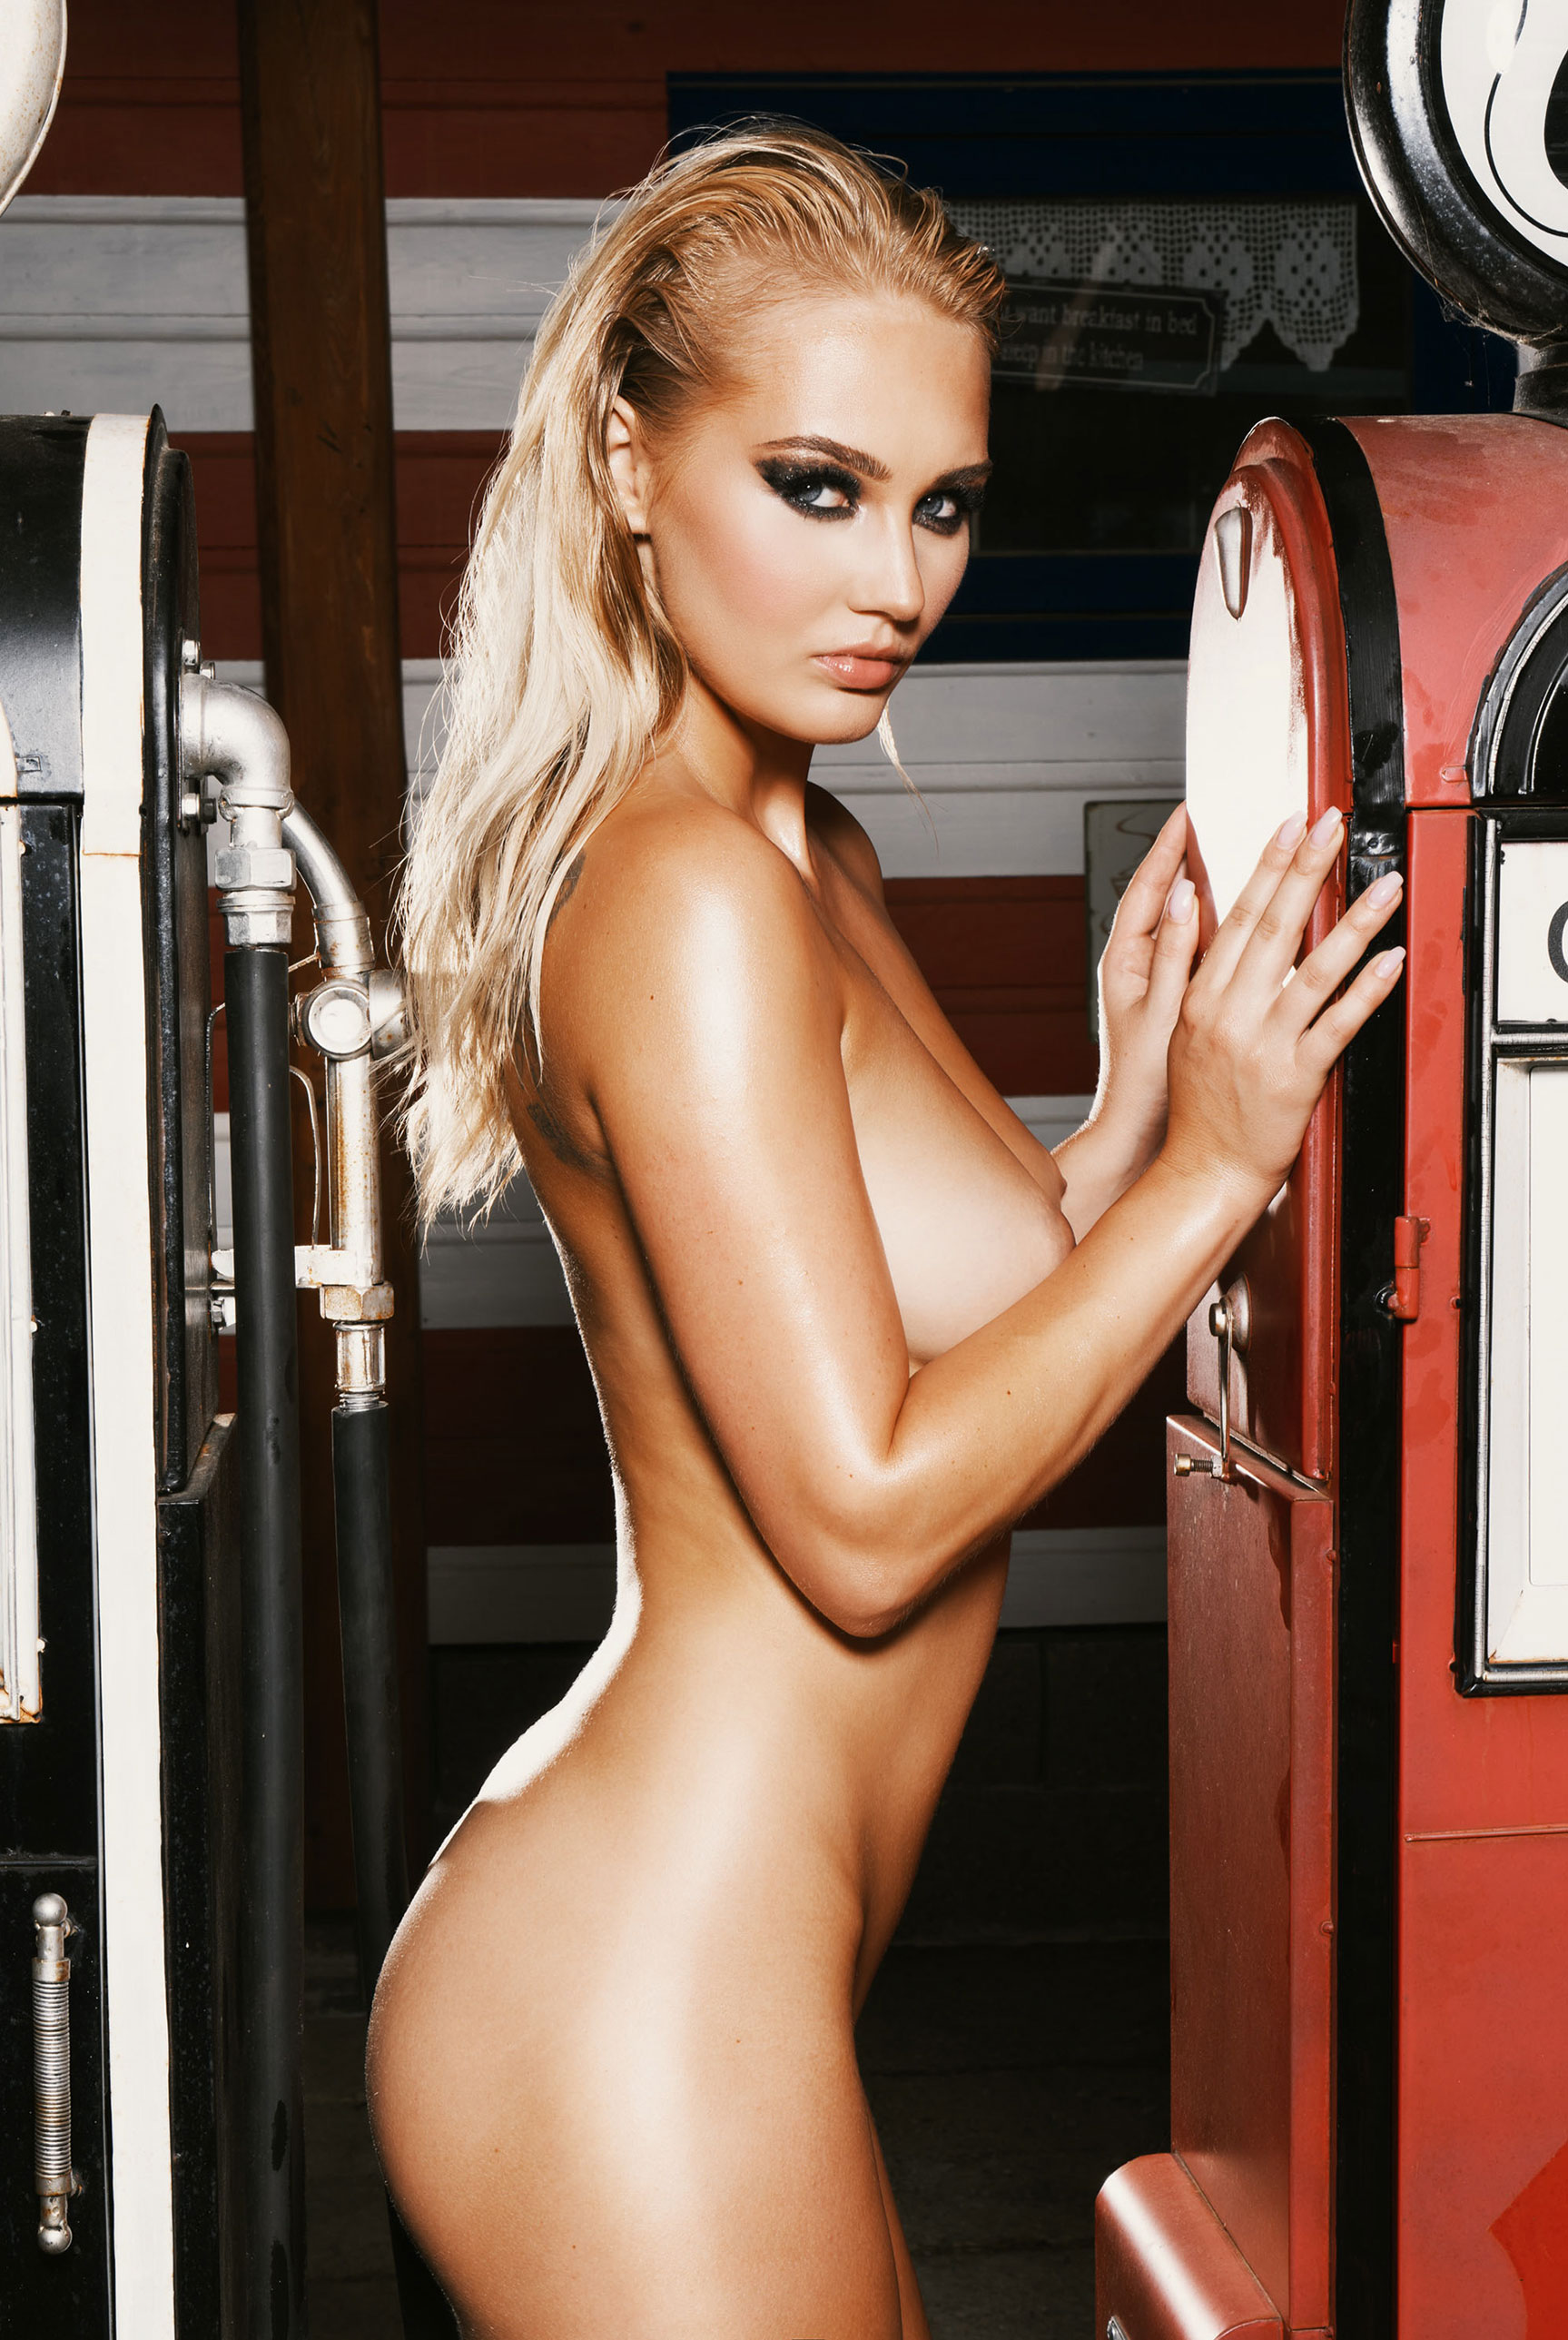 Девушка месяца чешского Плейбой / Sarka by Martin Bucek - Playboy Czech Republic october 2018 Playmate